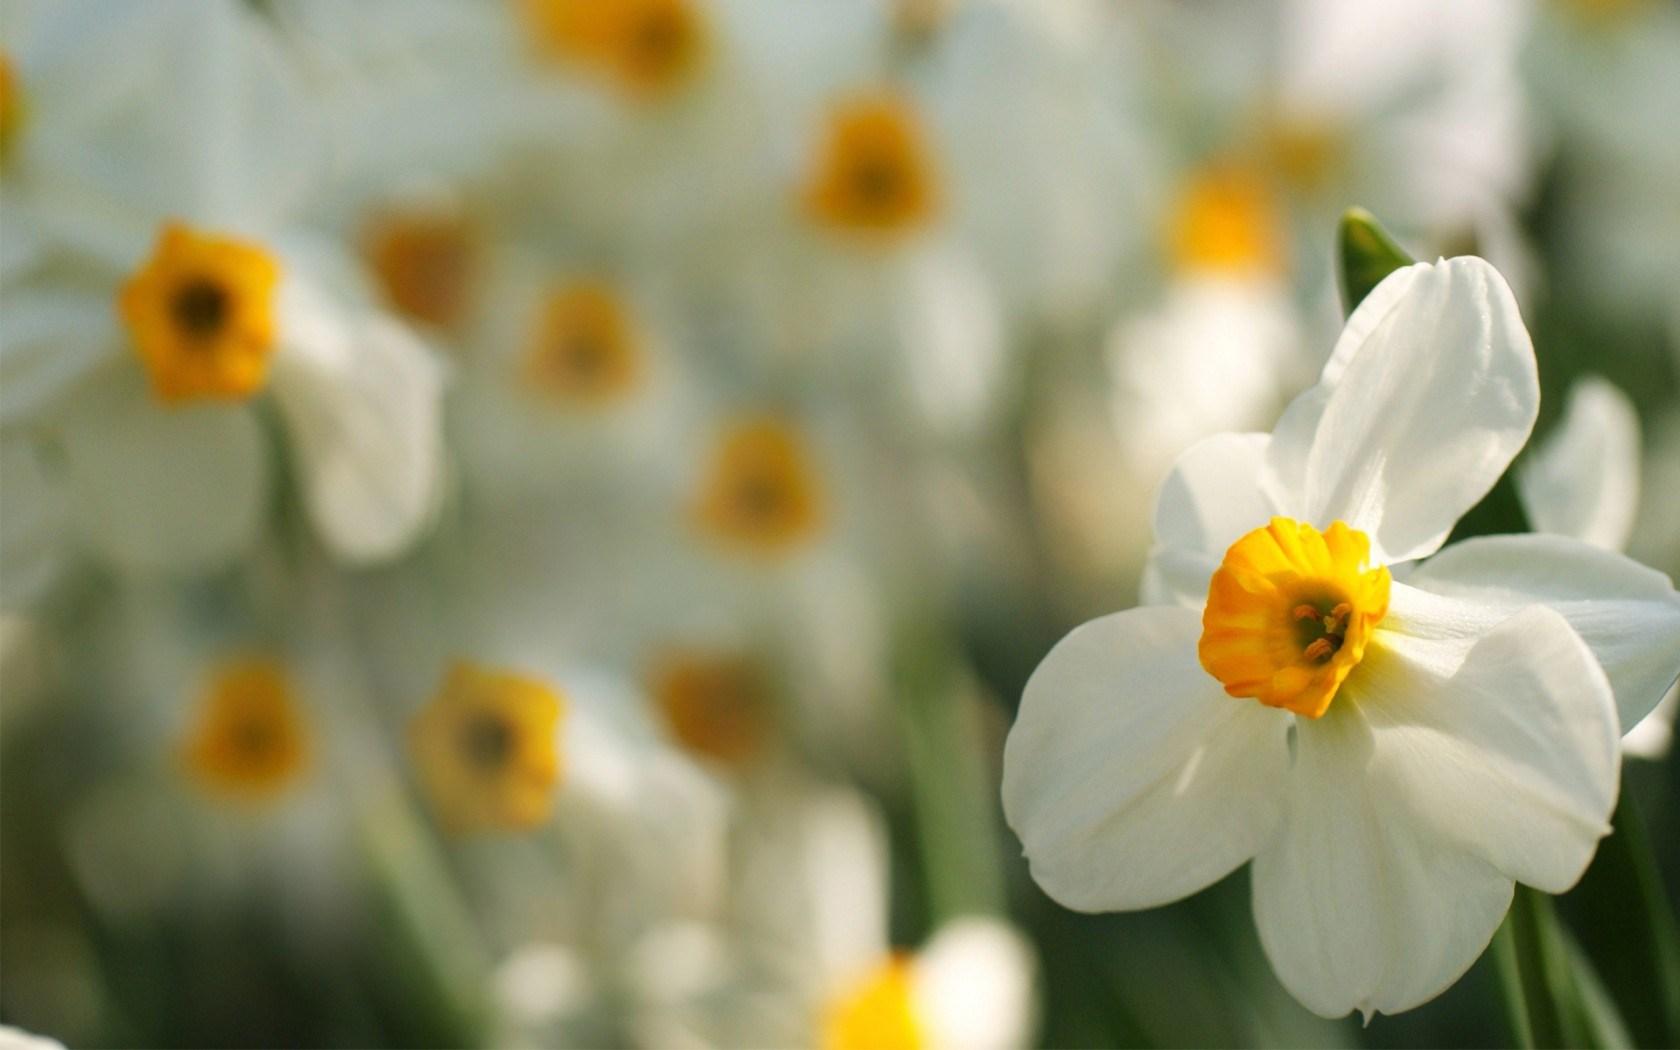 Daffodils Flowers Macro